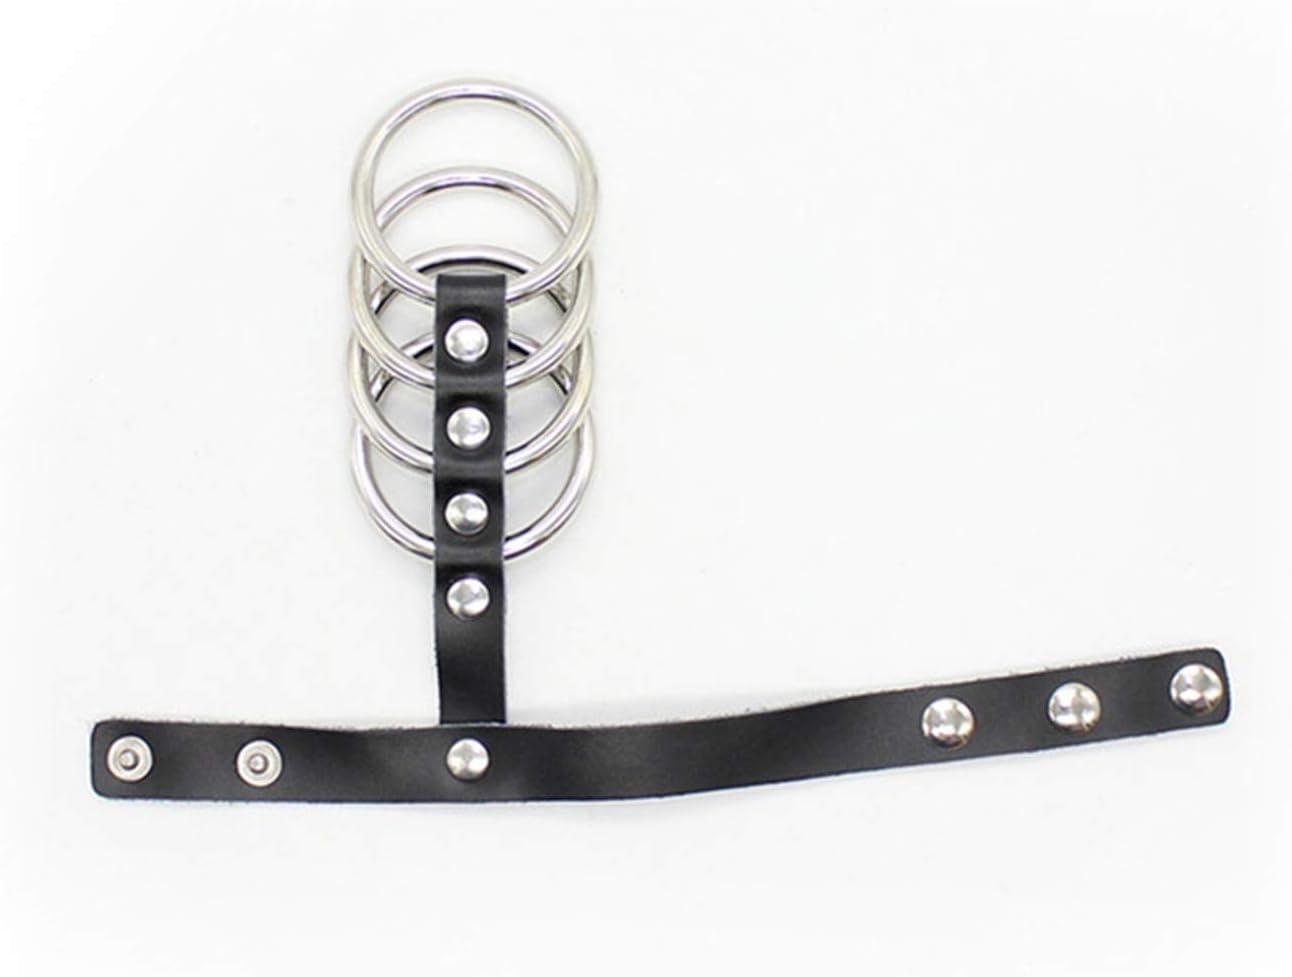 Stainless Steel P/énǐs R/ìngs Set Sleeves C/öckr/ìng Real Leather C/öck-R/ìng S/&M S/éx-Tǒy for Couple Ād/ùlt Men Male Chastity Belts